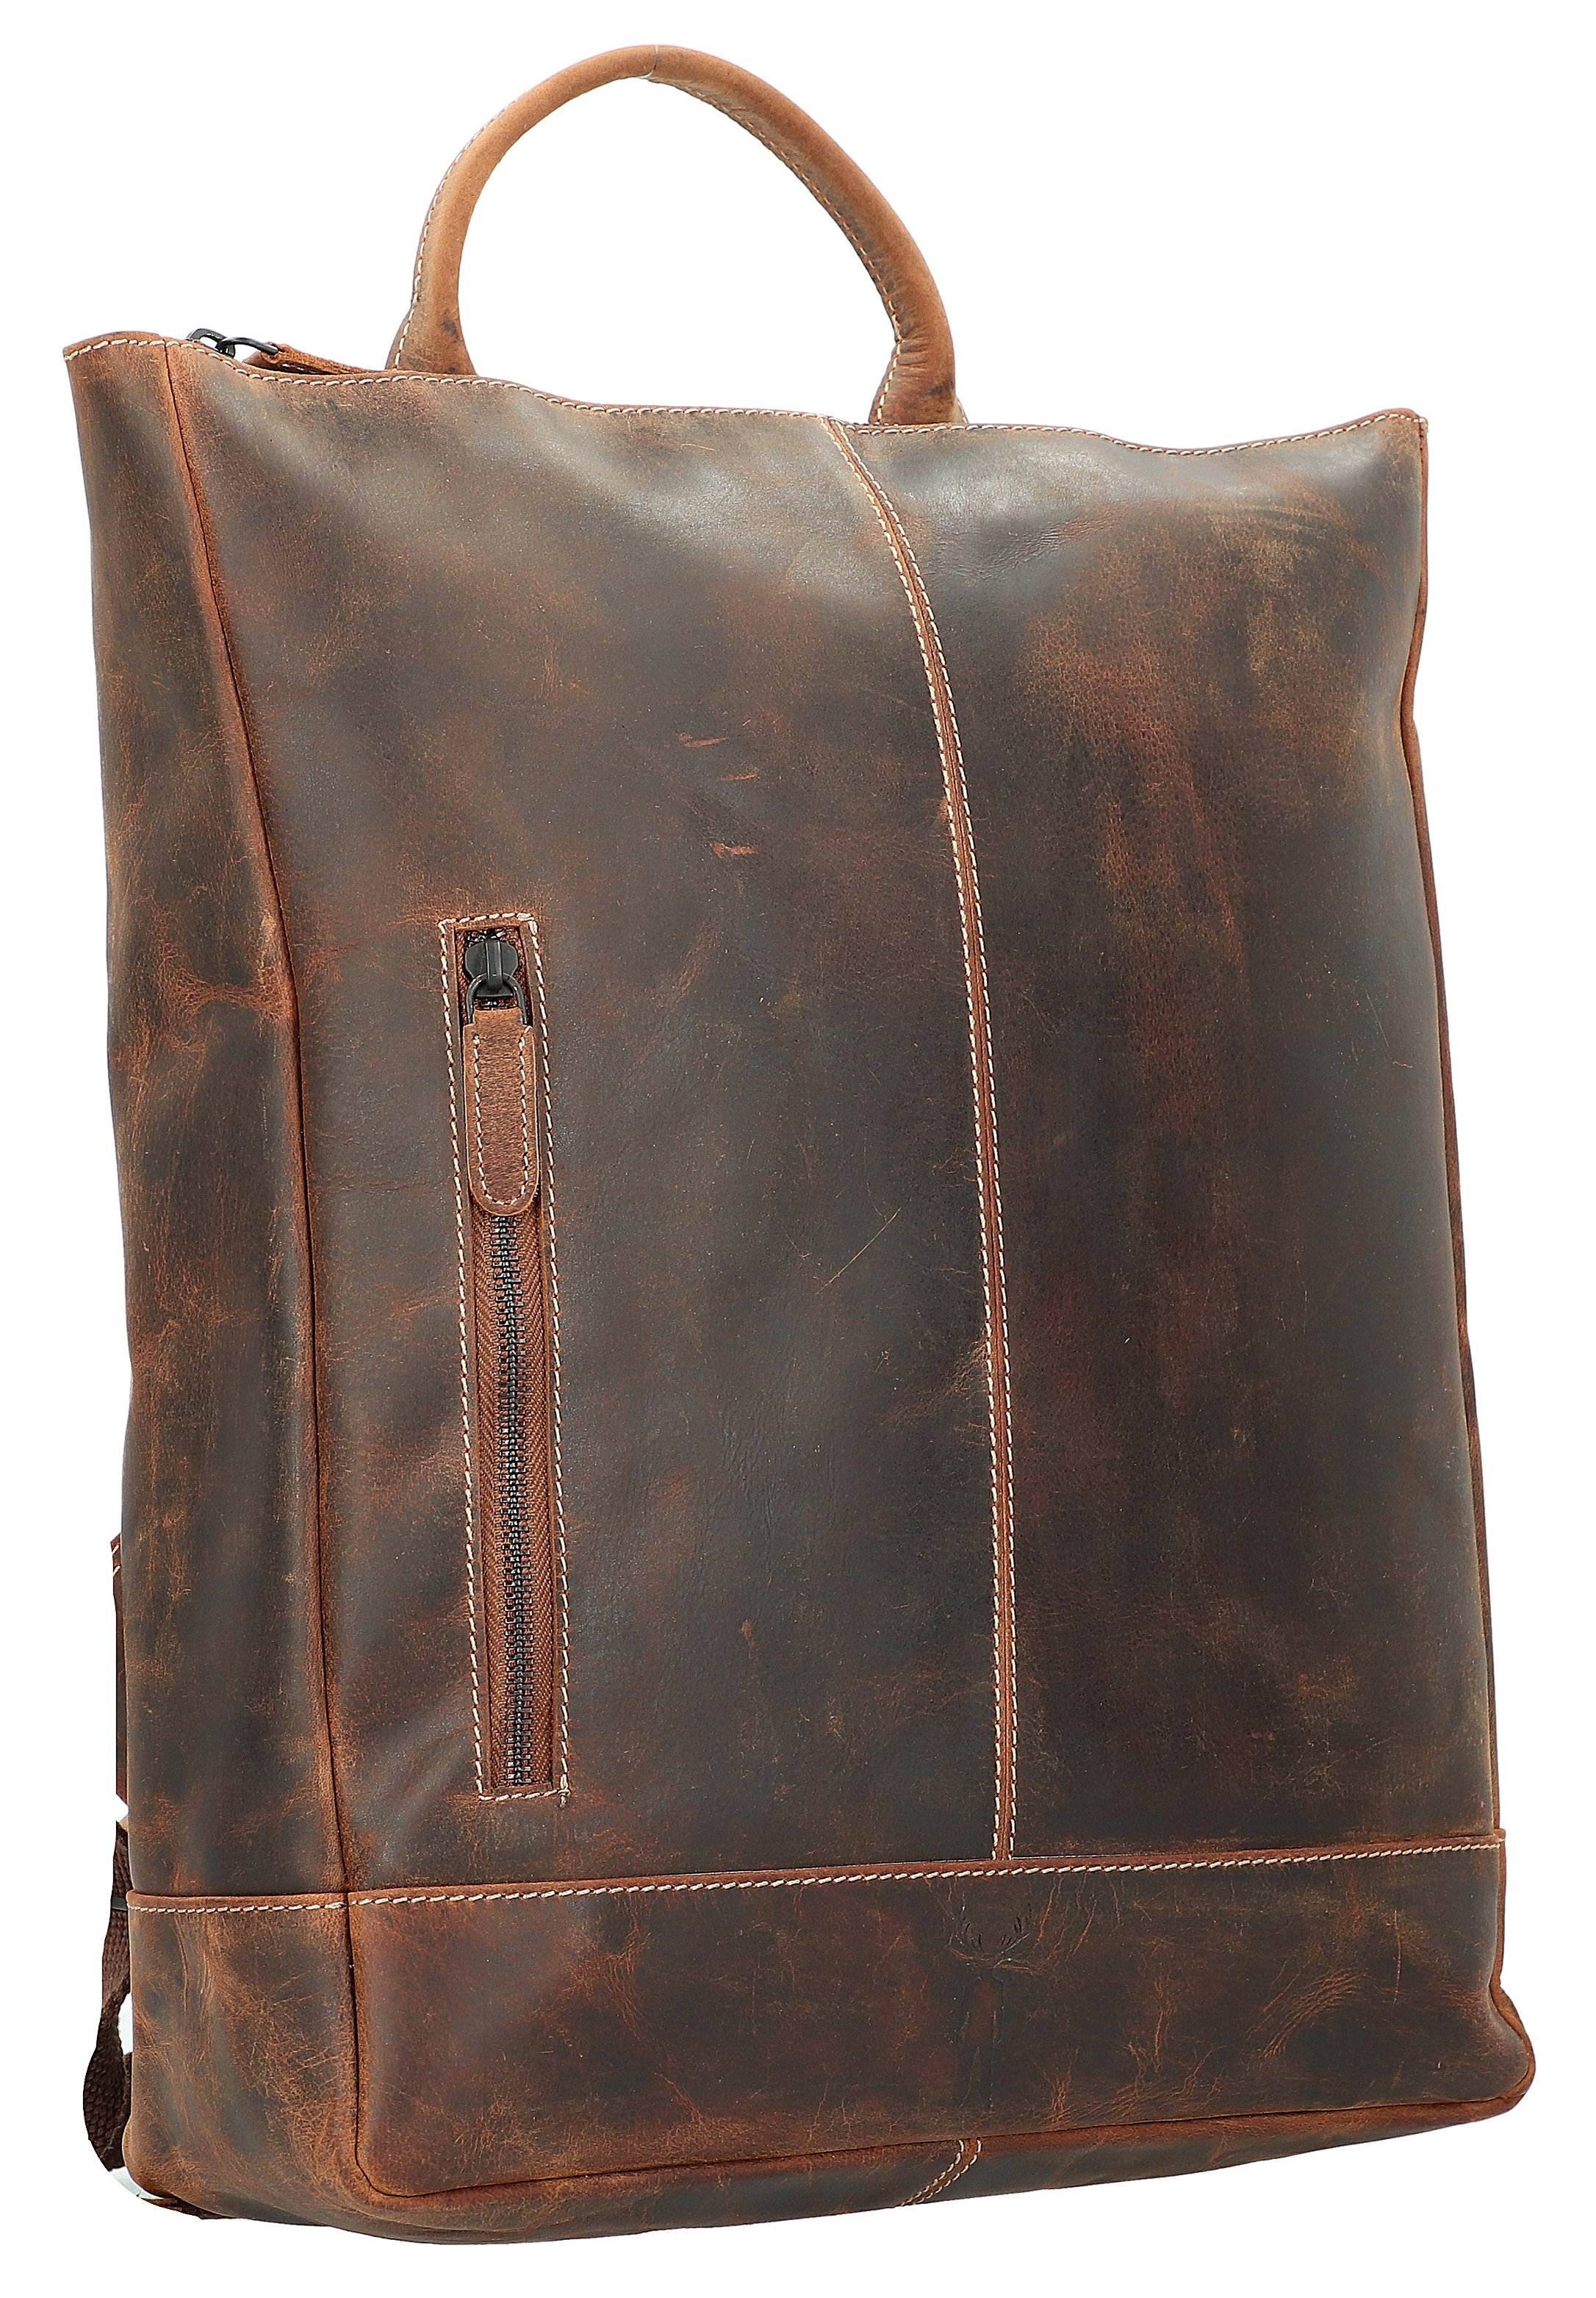 Jack Kinsky BALTIMORE LAPTOPFACH - Tagesrucksack - cognac/braun - Herrentaschen FHrov